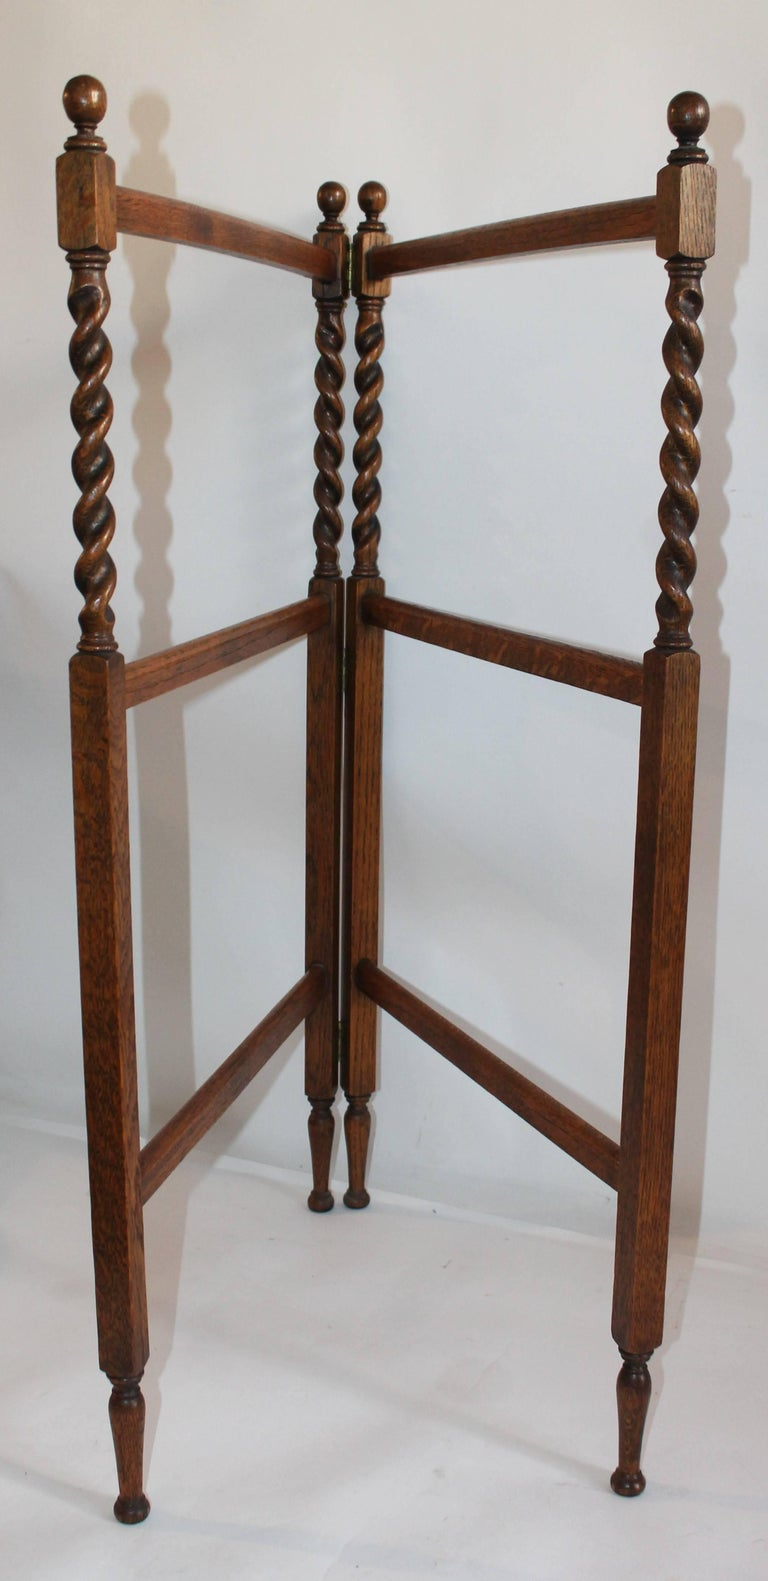 19th Century Oak Quilt Rack in Barley Twist Form 2